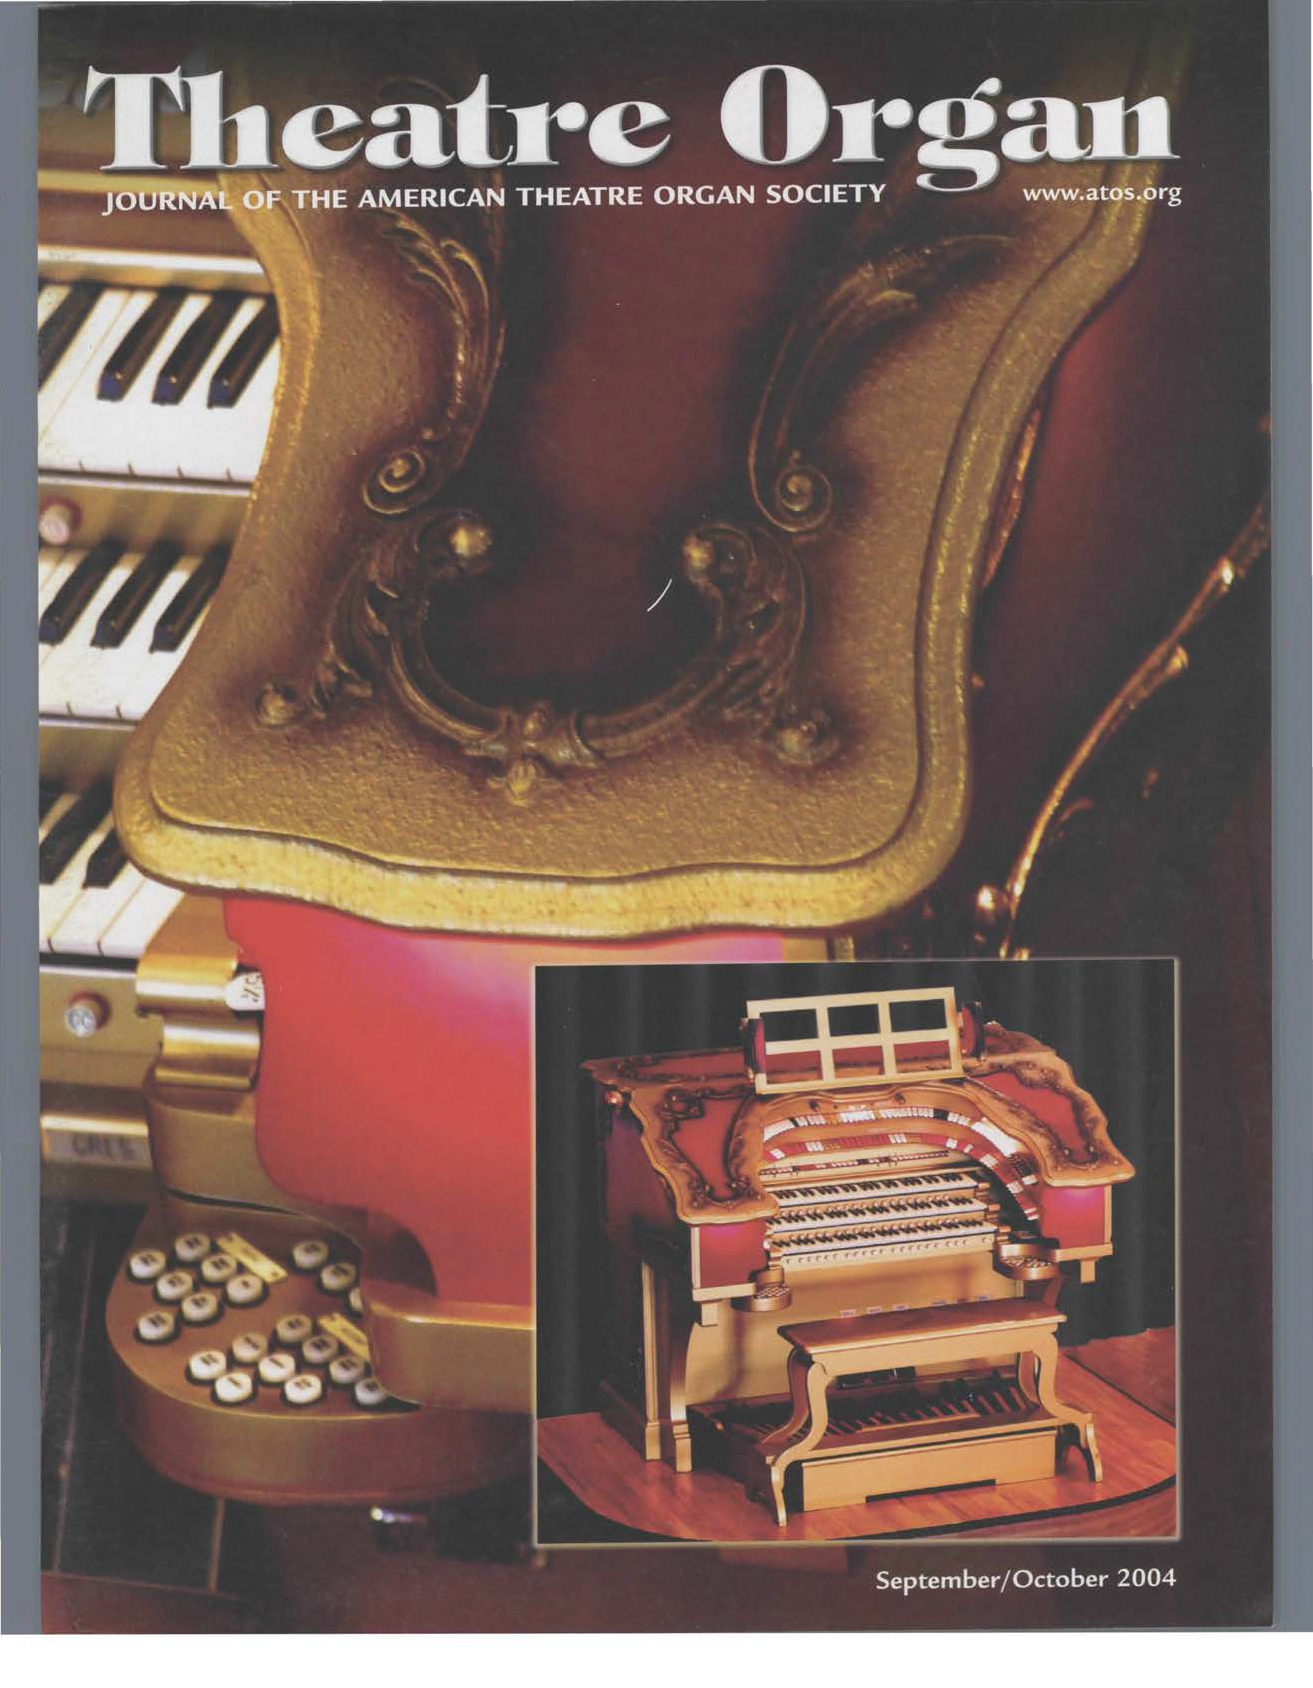 Theatre Organ, September - October 2004, Volume 46, Number 5